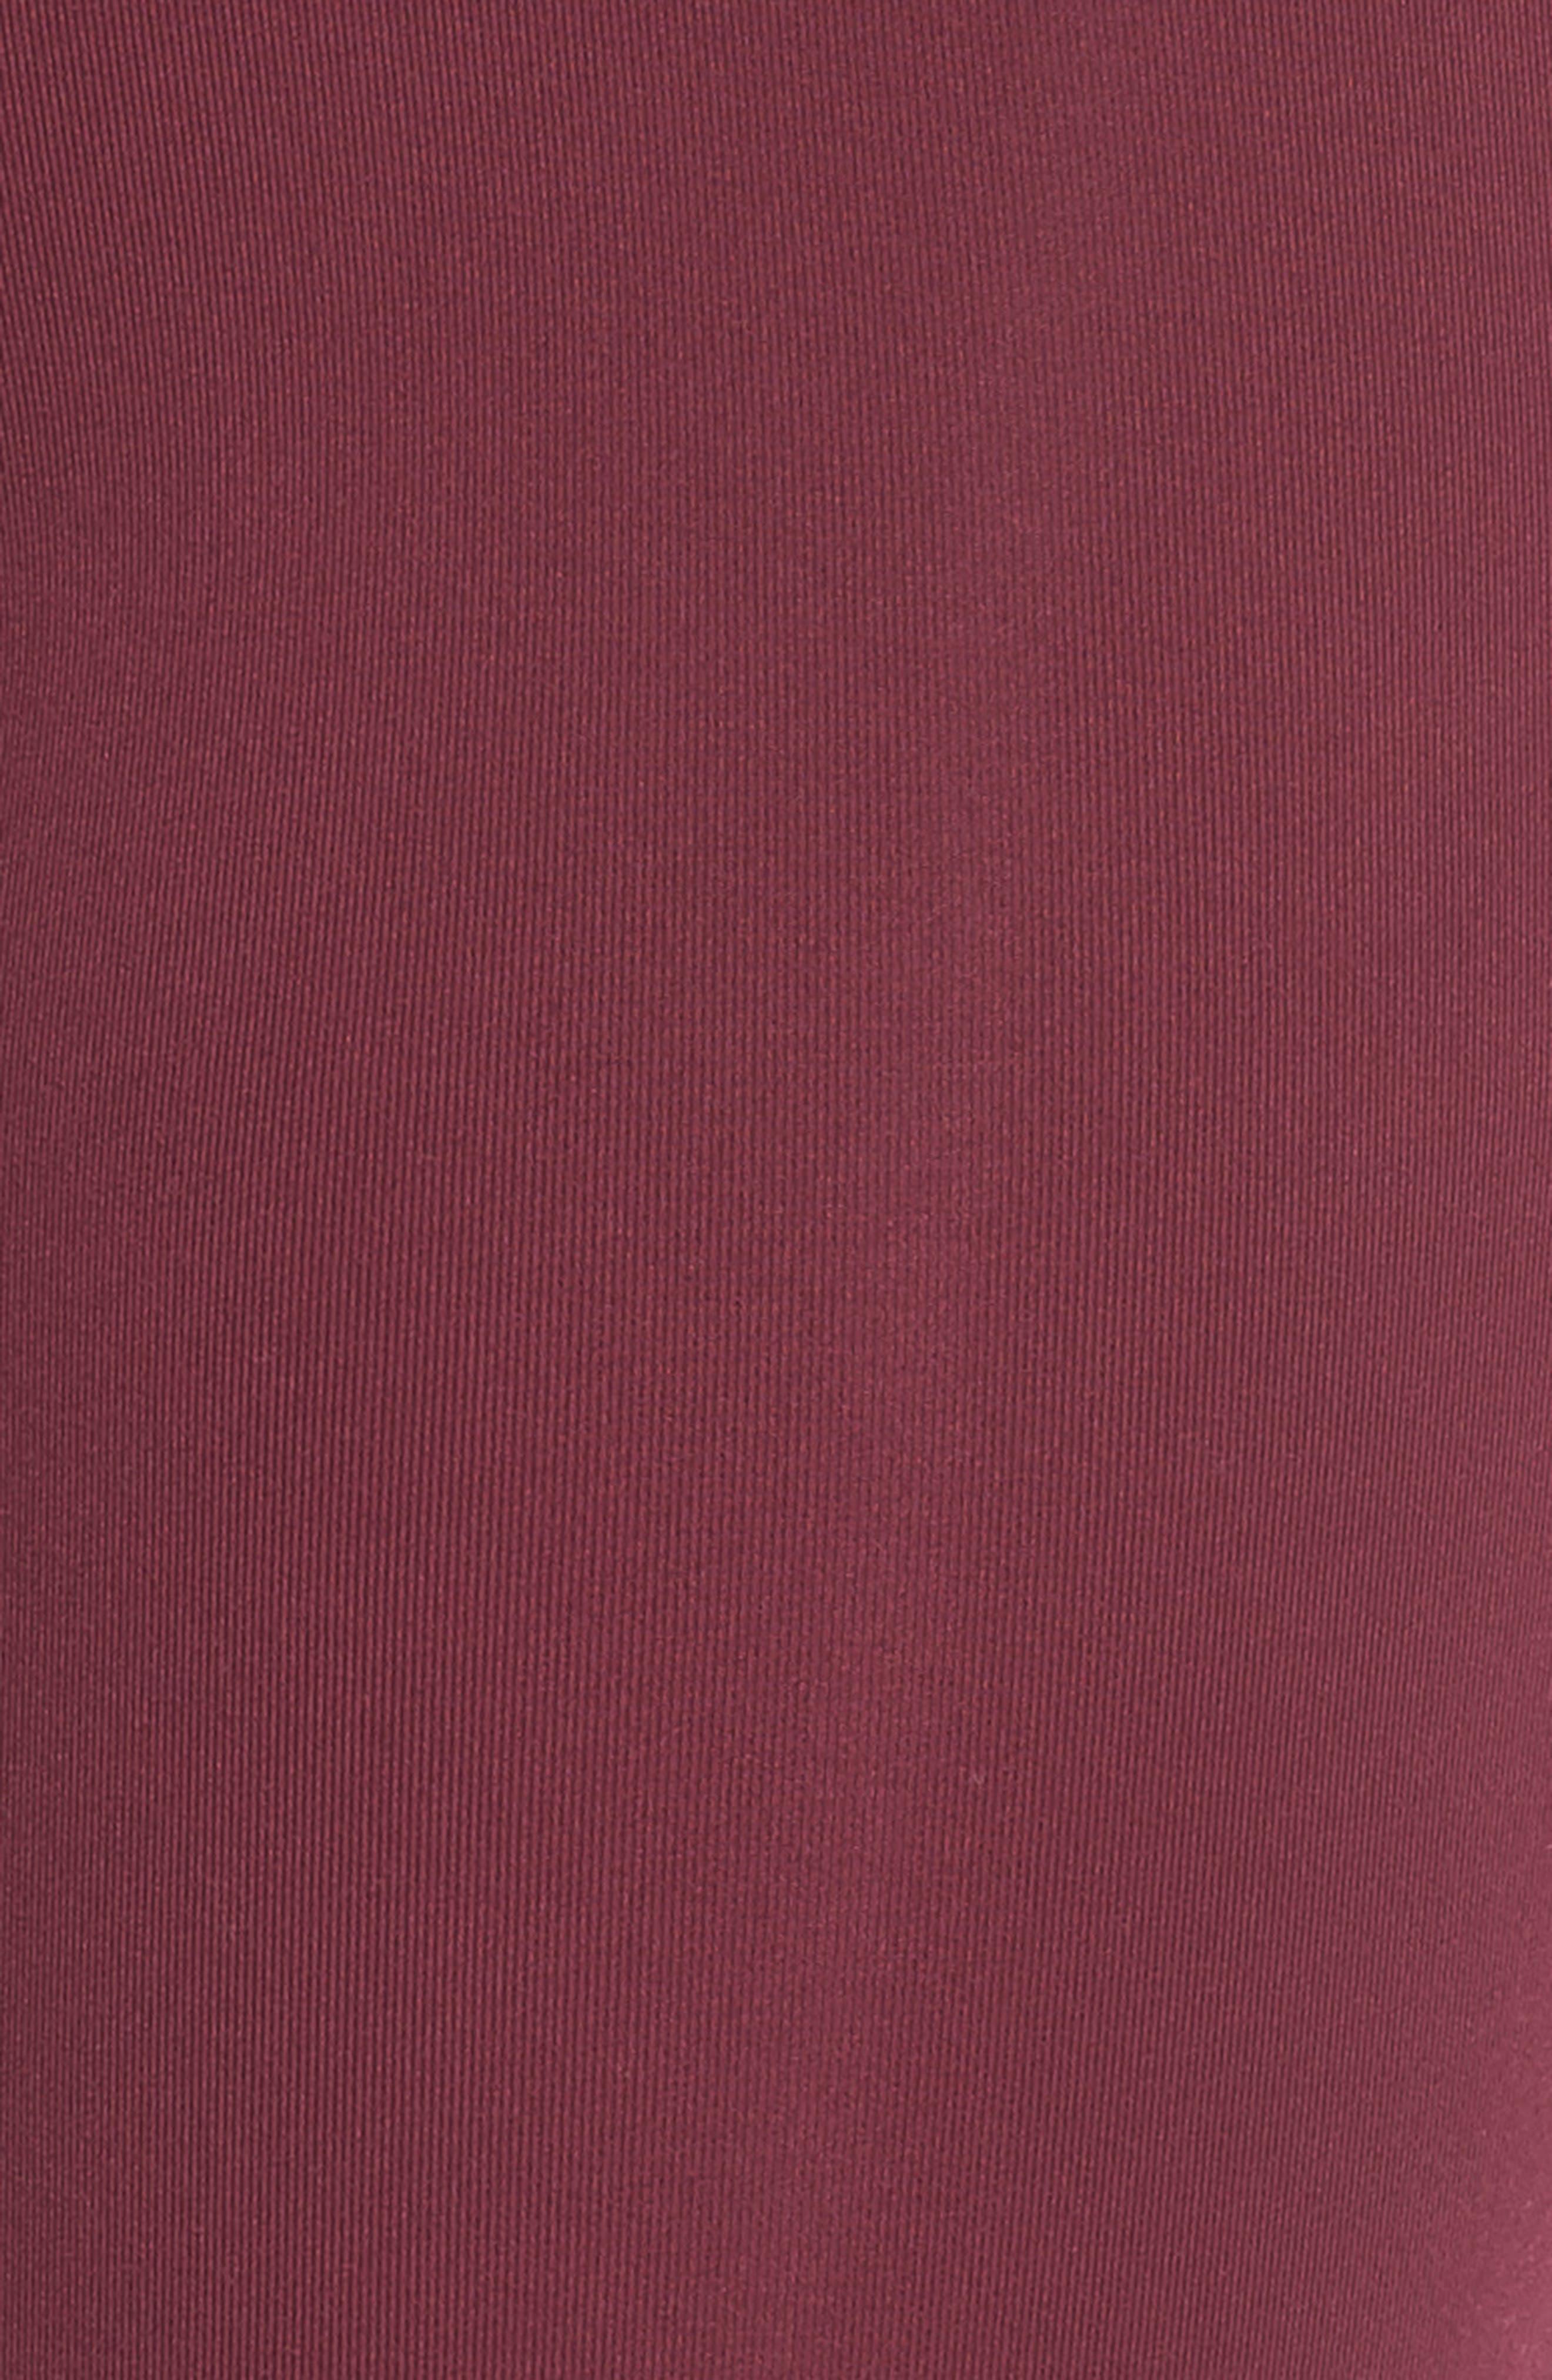 Infinity Cutout Crop Leggings,                             Alternate thumbnail 6, color,                             Wine